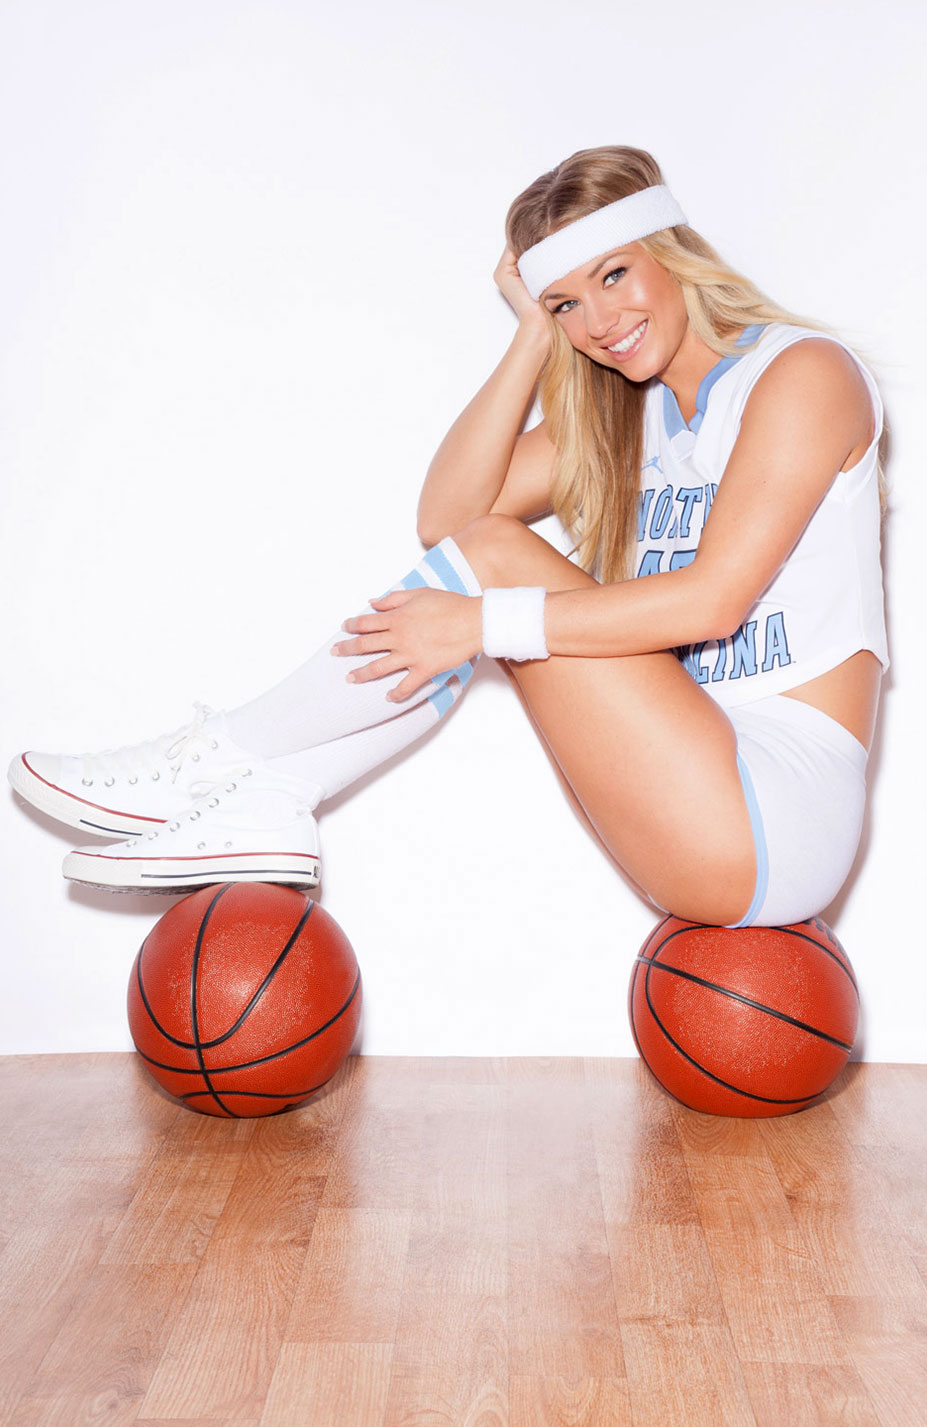 Никки Ли играет в баскетбол в форме команды North Carolina Tar Heels / Nikki Leigh - College Basketball